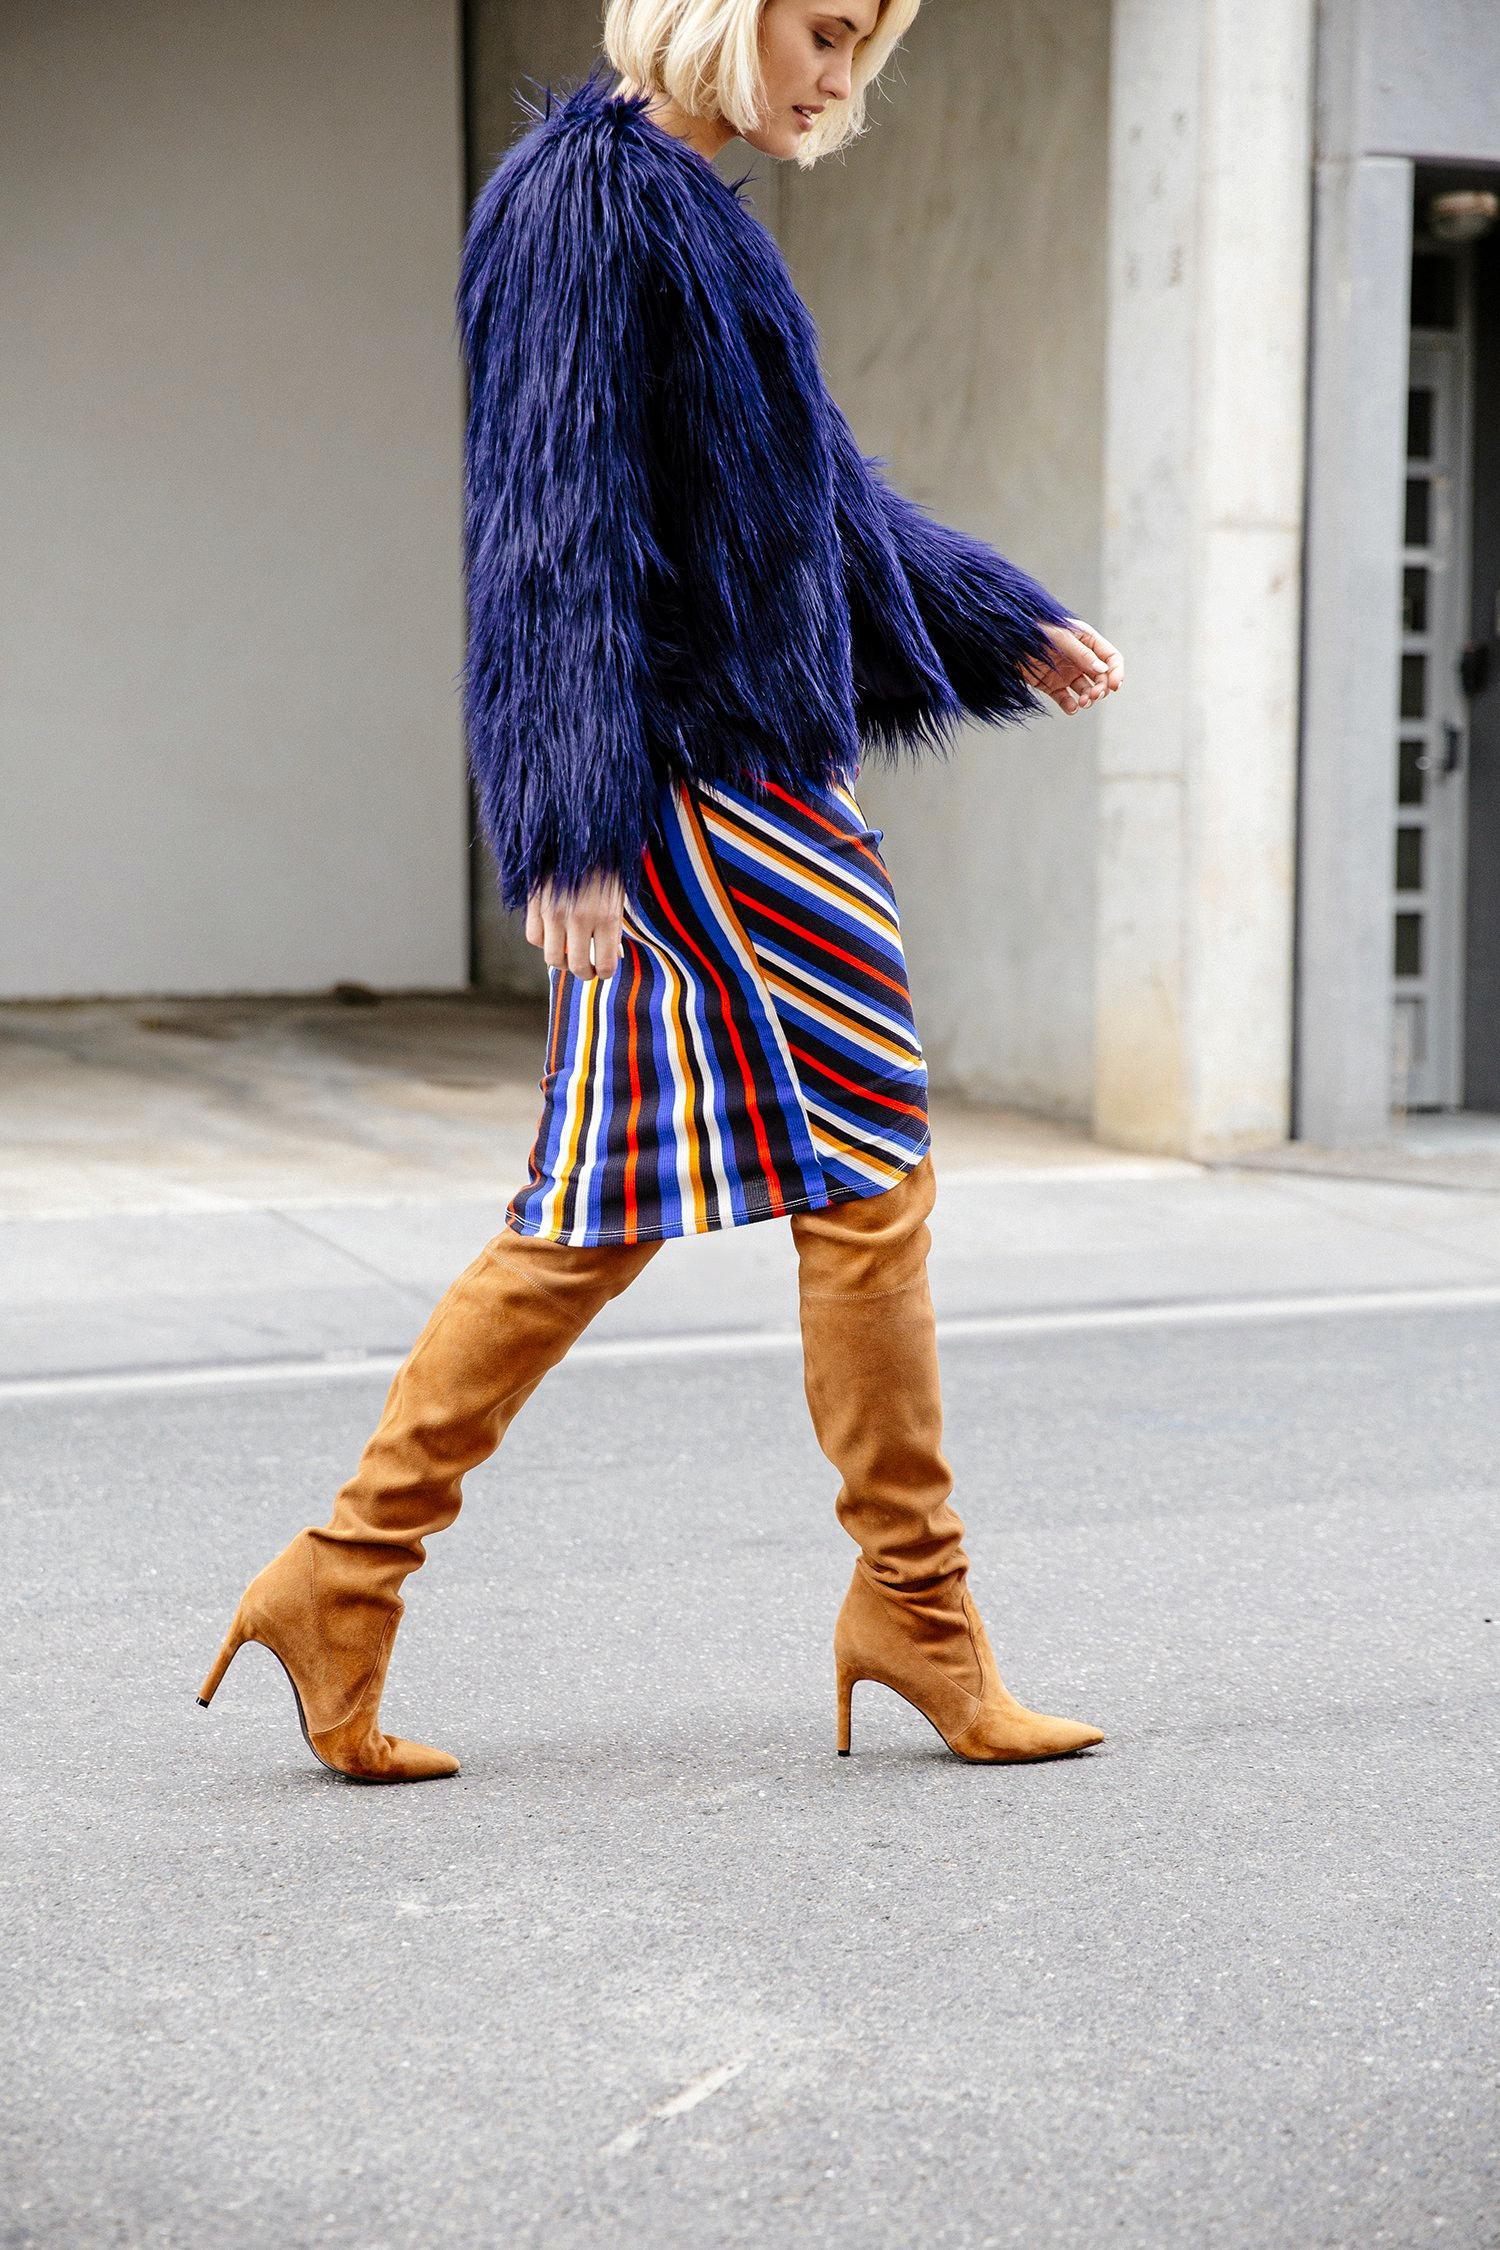 Knee-high boots.